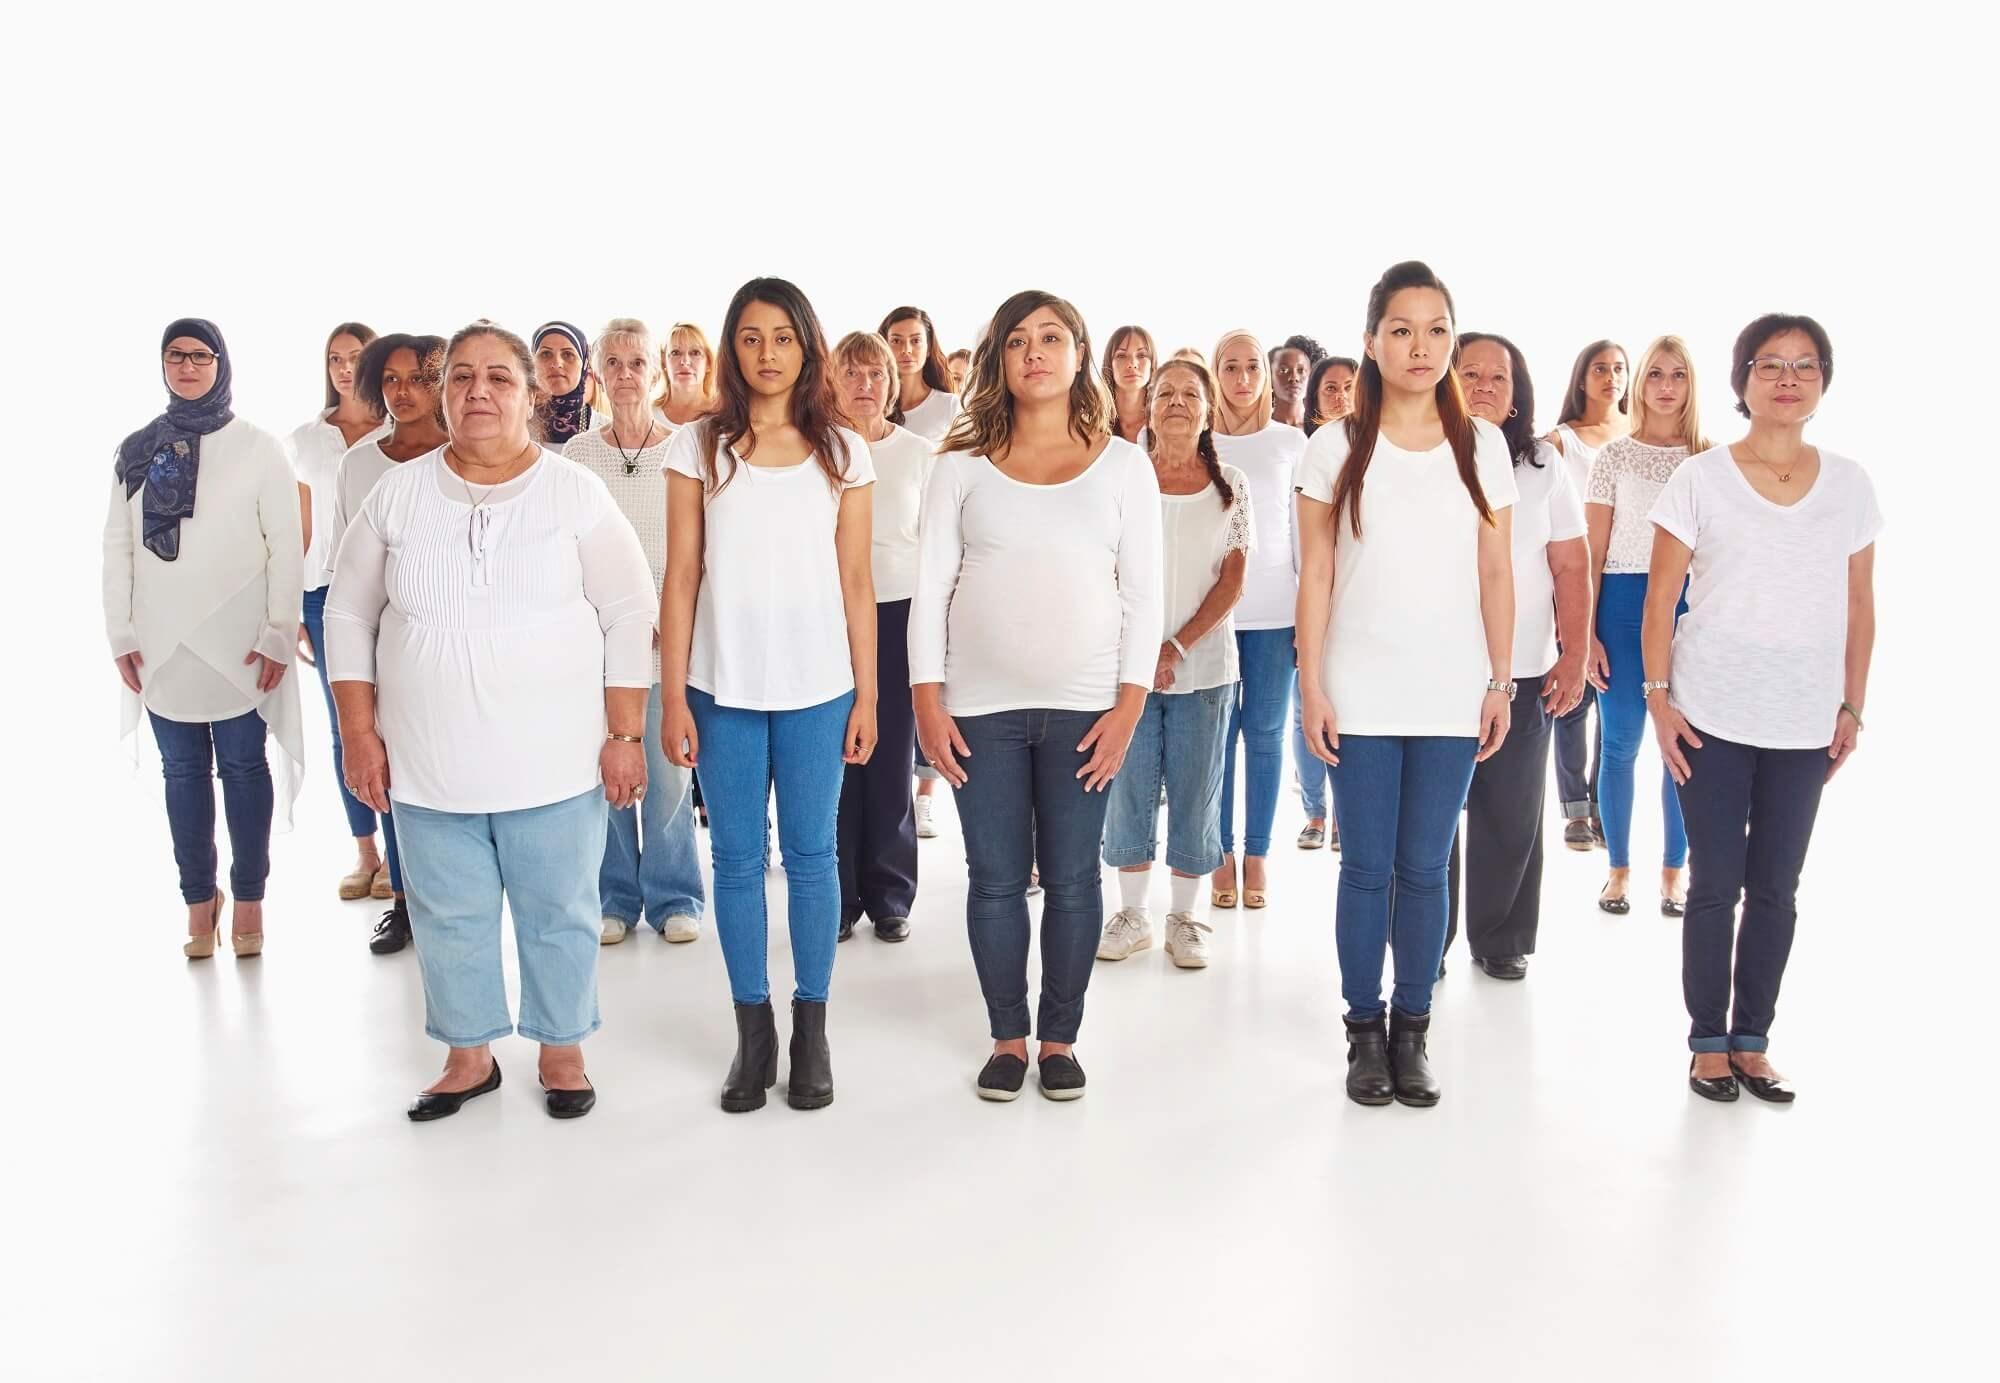 Half of Women to Develop Stroke, Dementia, or Parkinsonism